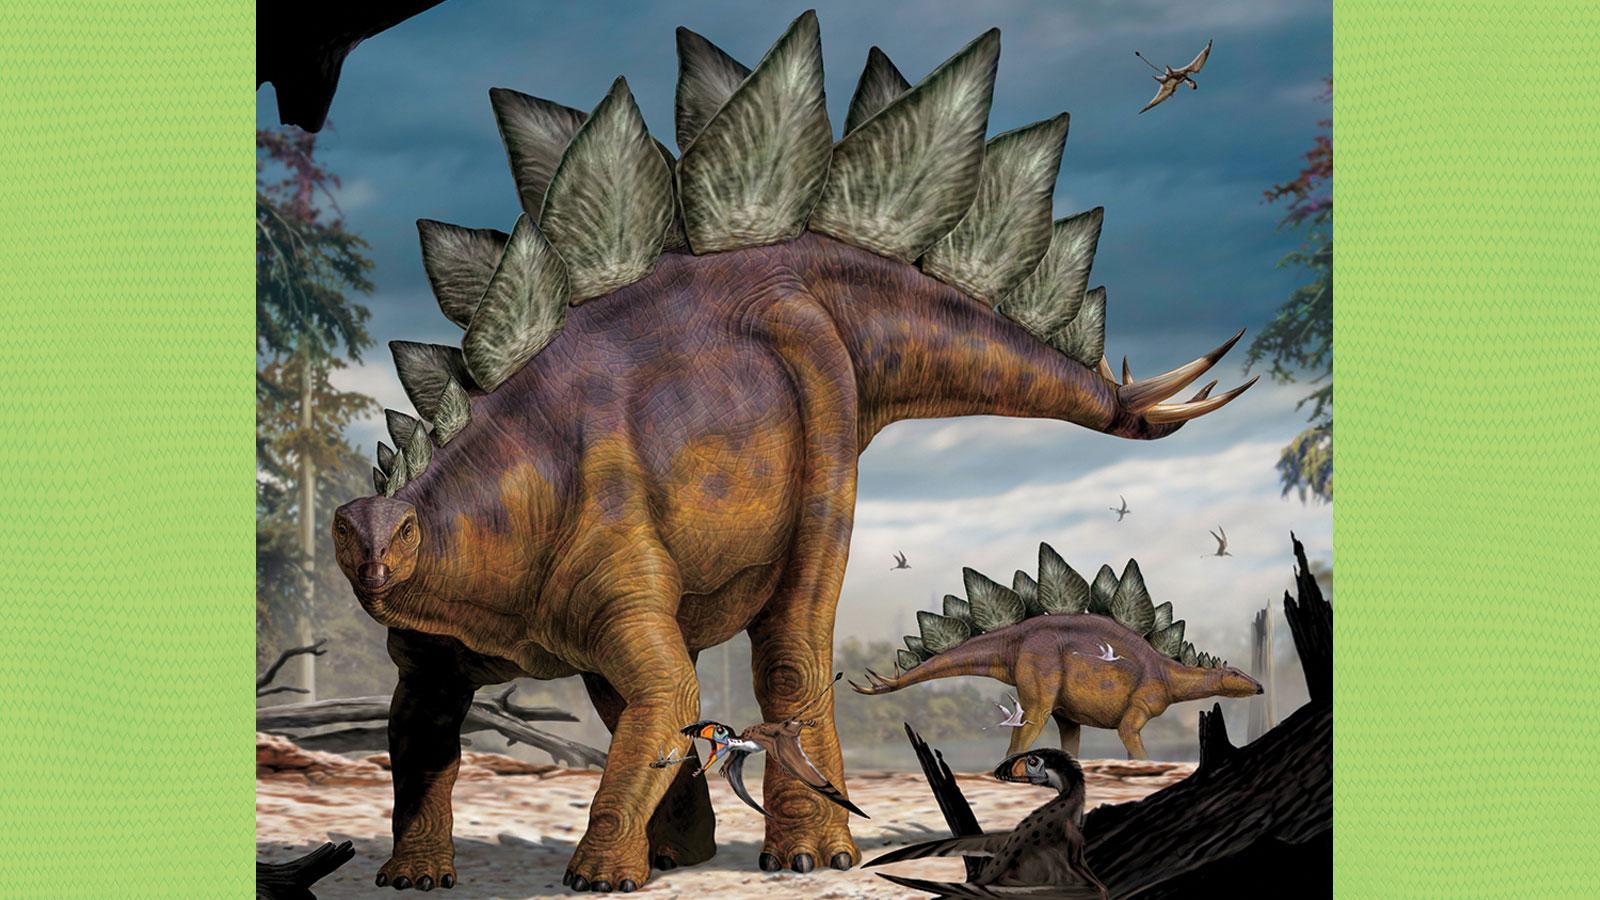 HQ Stegosaurus Wallpapers   File 316.69Kb